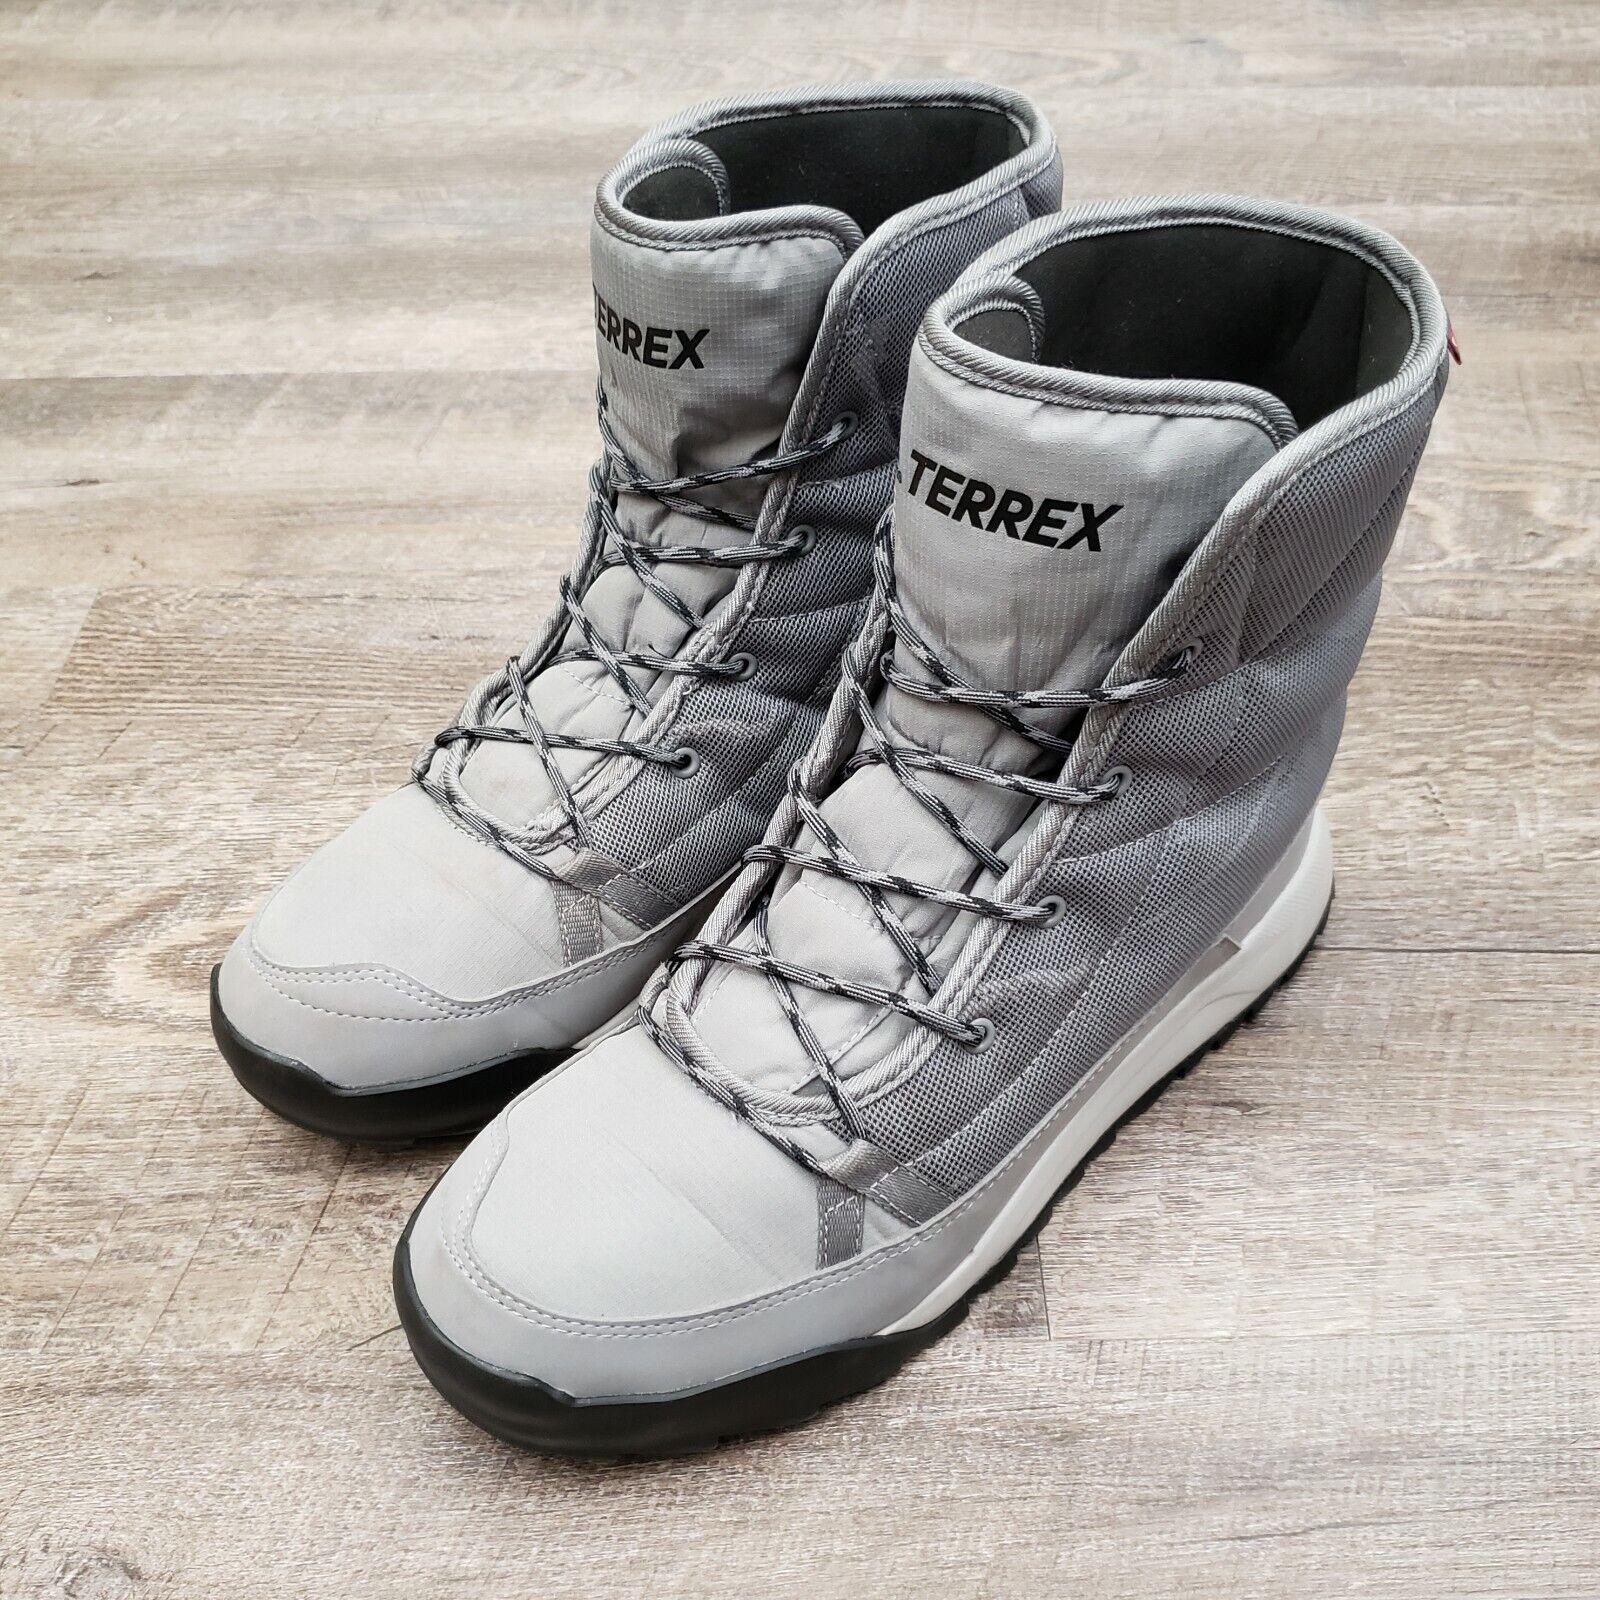 adidas Women's Size 9.5 Terrex Choleah